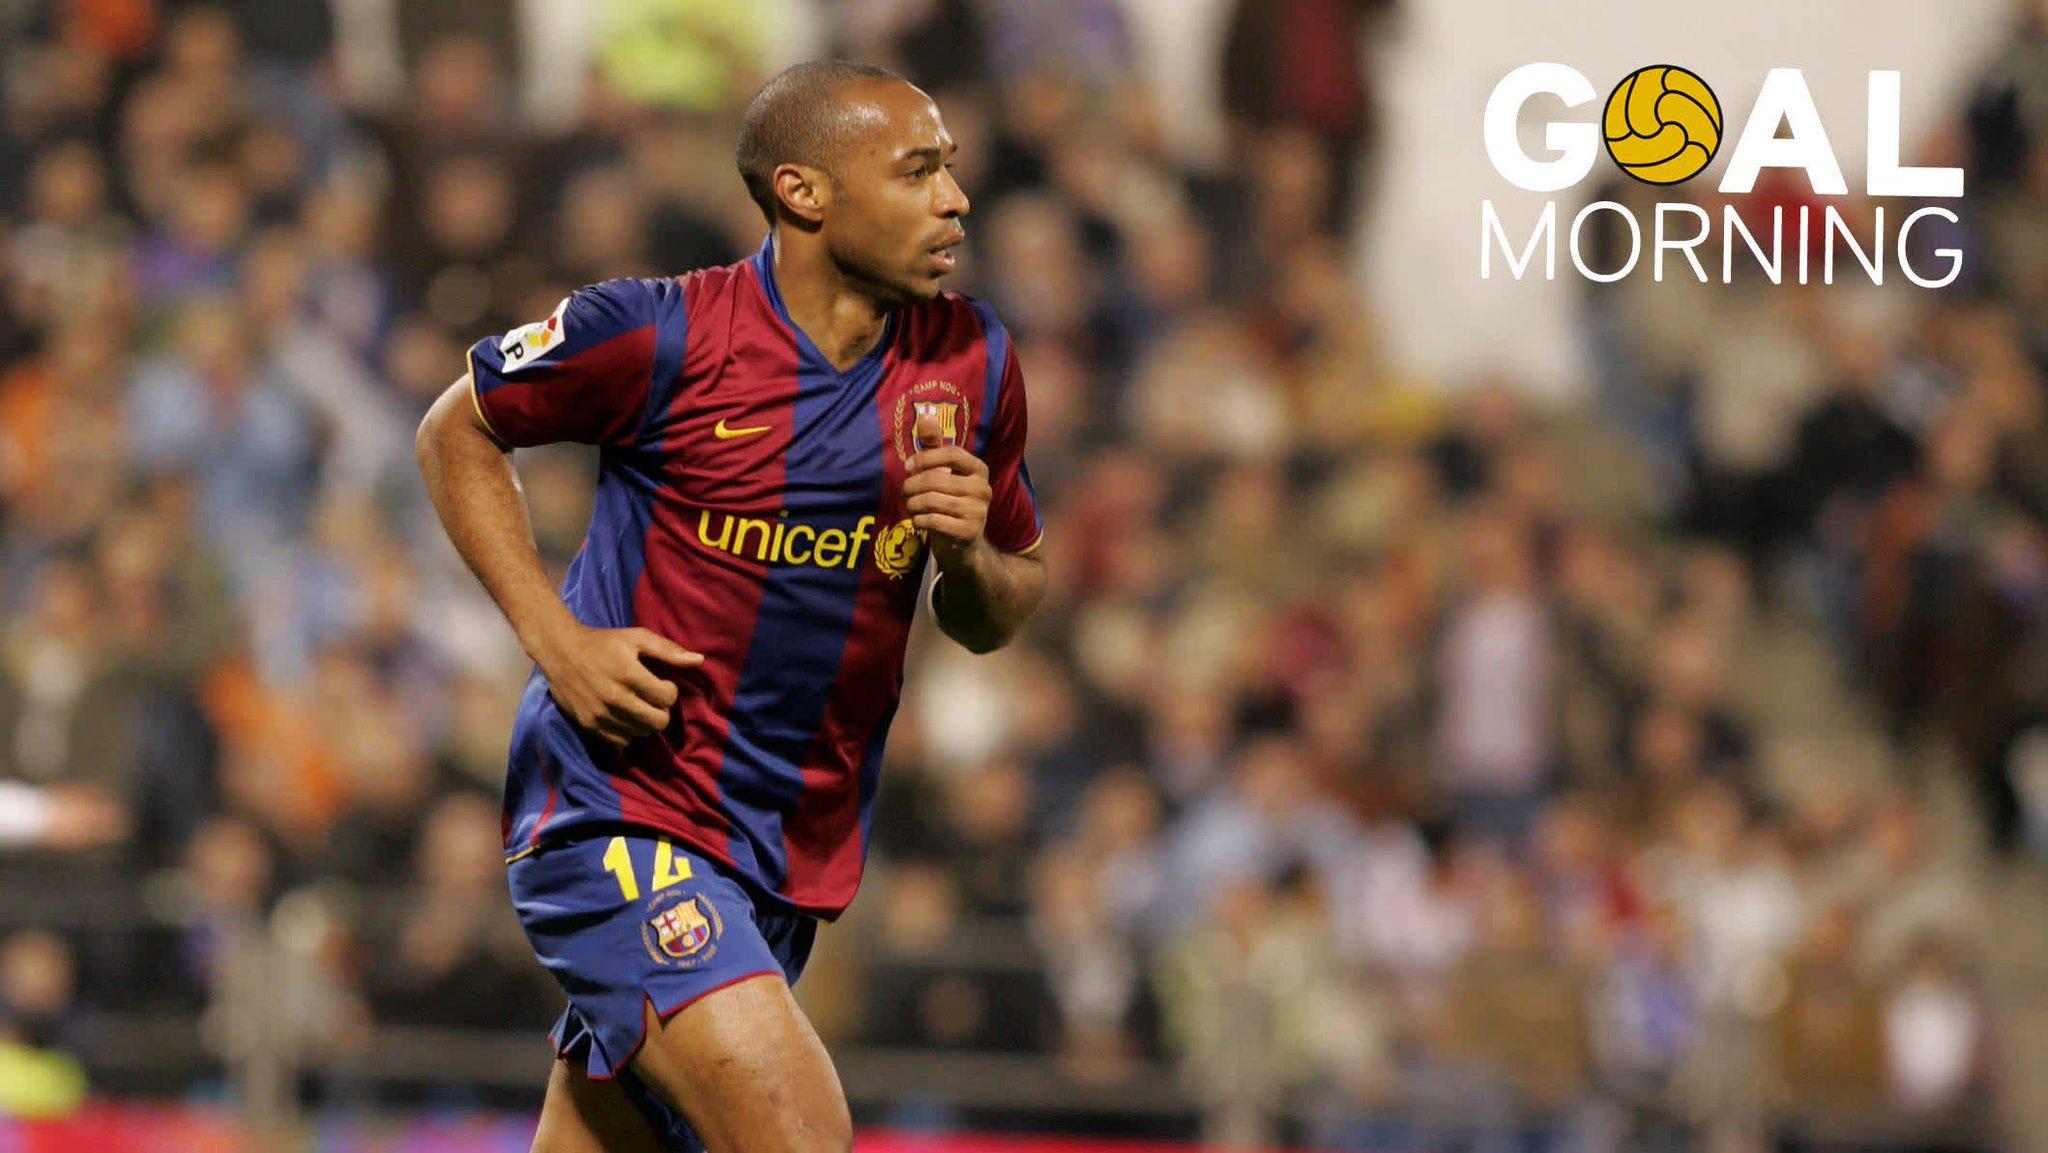 G⚽️AL MORNING!!! ⚽ #LevanteBarça �� @ThierryHenry �� �� Levante �� 2007/2008 https://t.co/sSKVQmsjzU